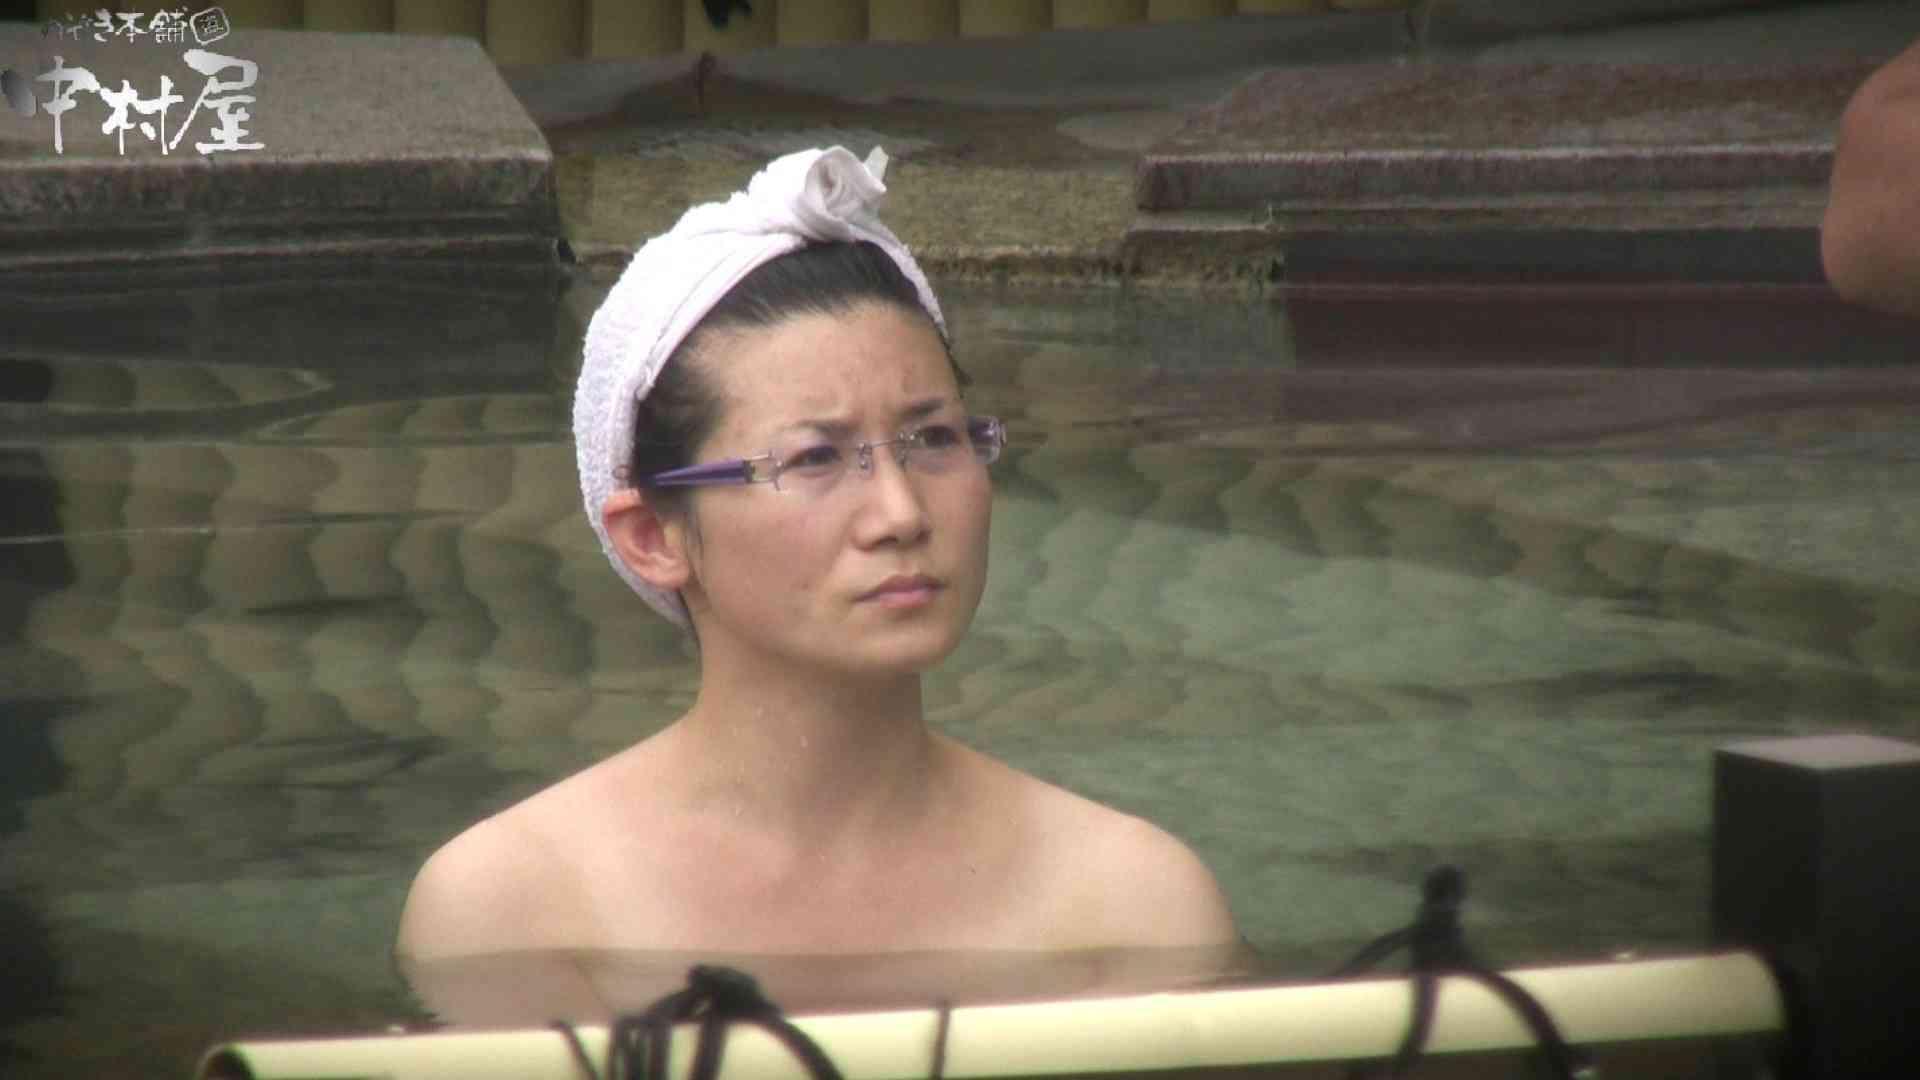 Aquaな露天風呂Vol.905 露天風呂   OLのエロ生活  99連発 34